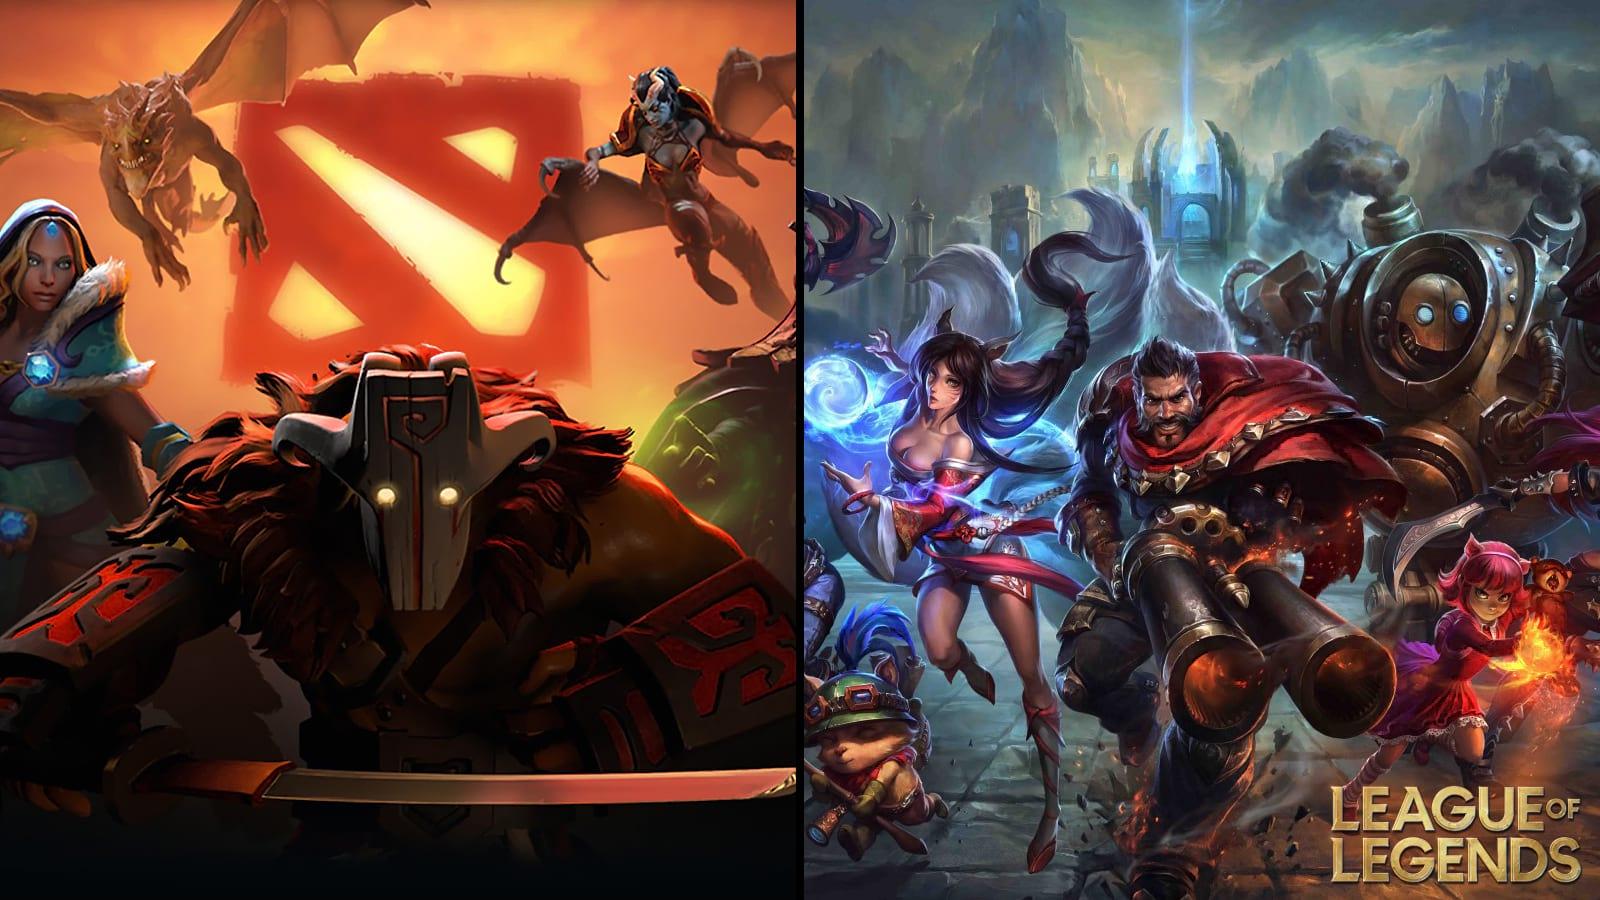 Valve / Riot Games